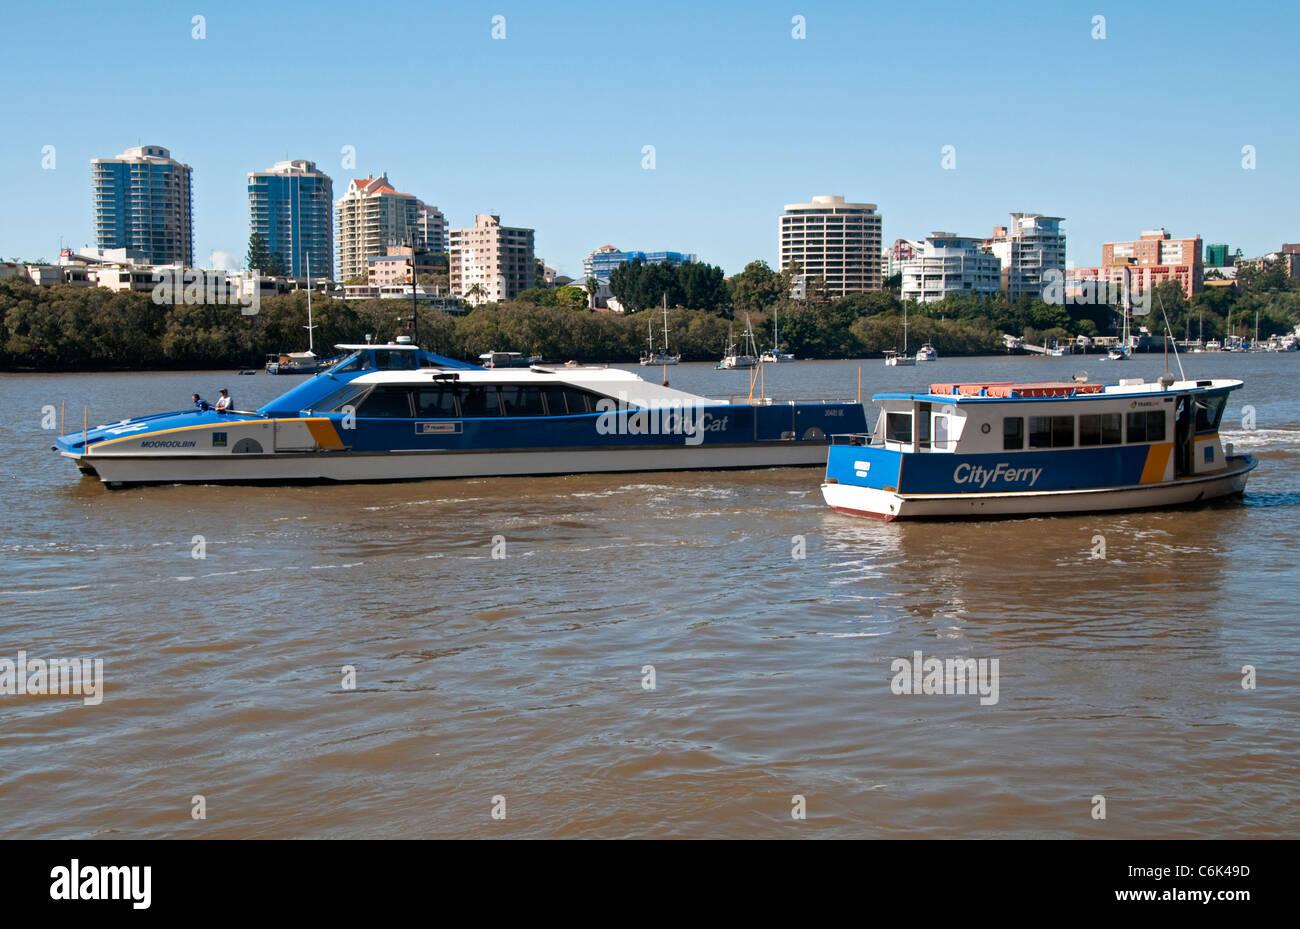 City Cat Ferry on the Brisbane River, Brisbane, Queensland,  Australia - Stock Image